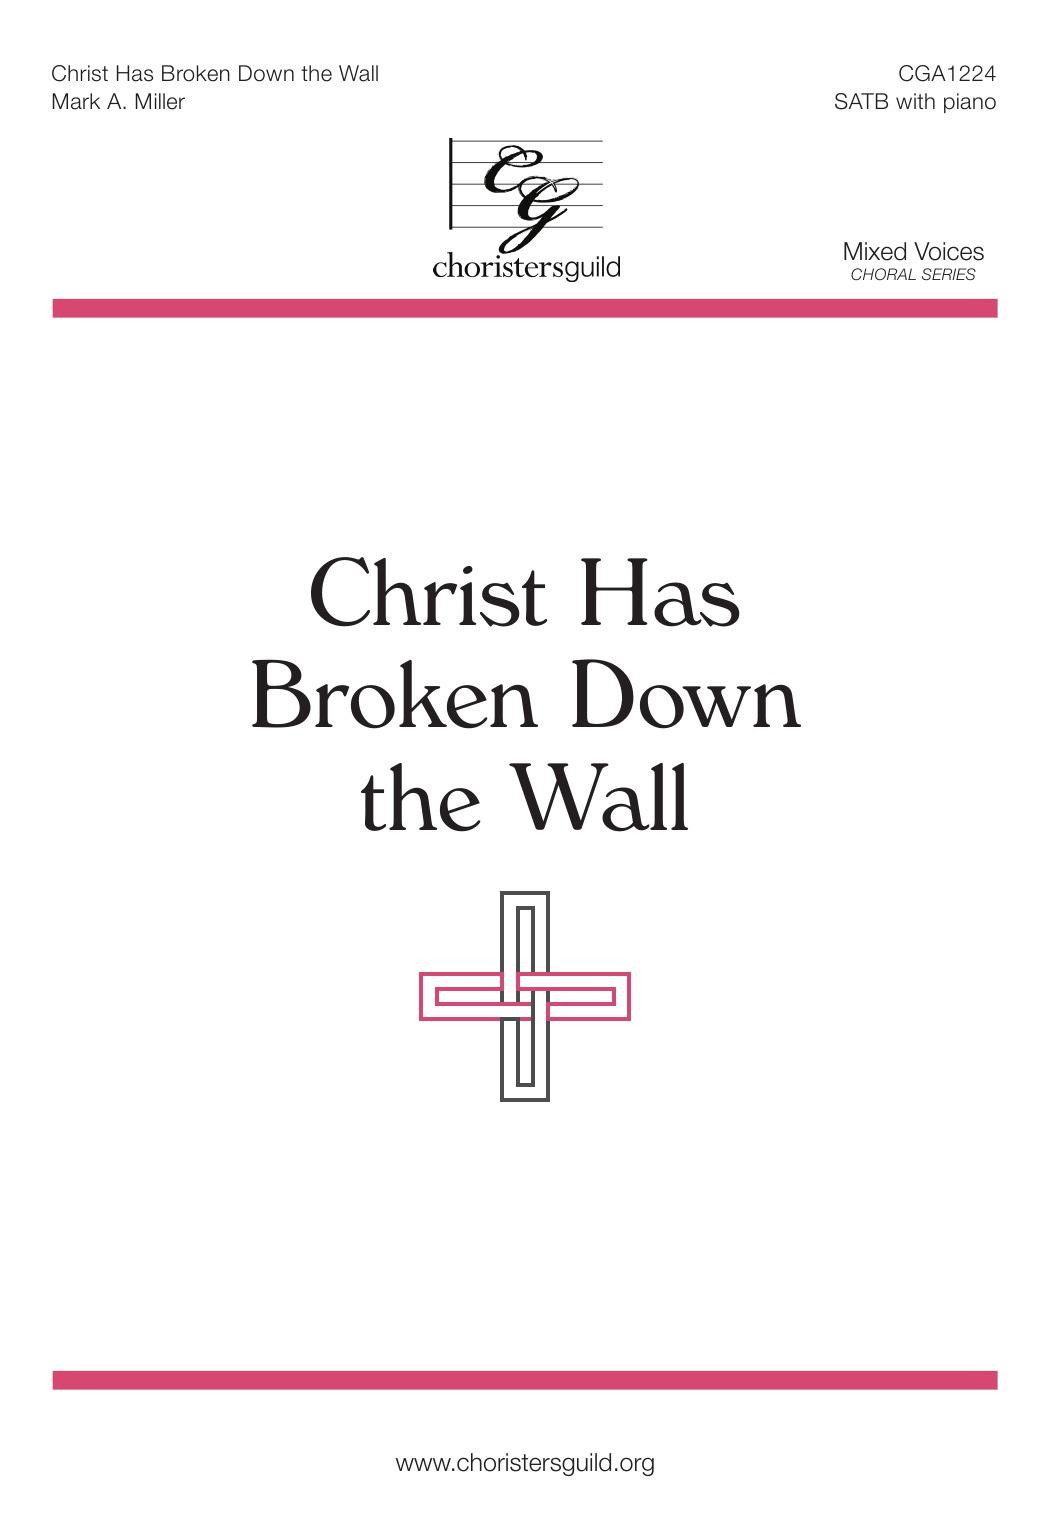 Christ Has Broken Down the Wall